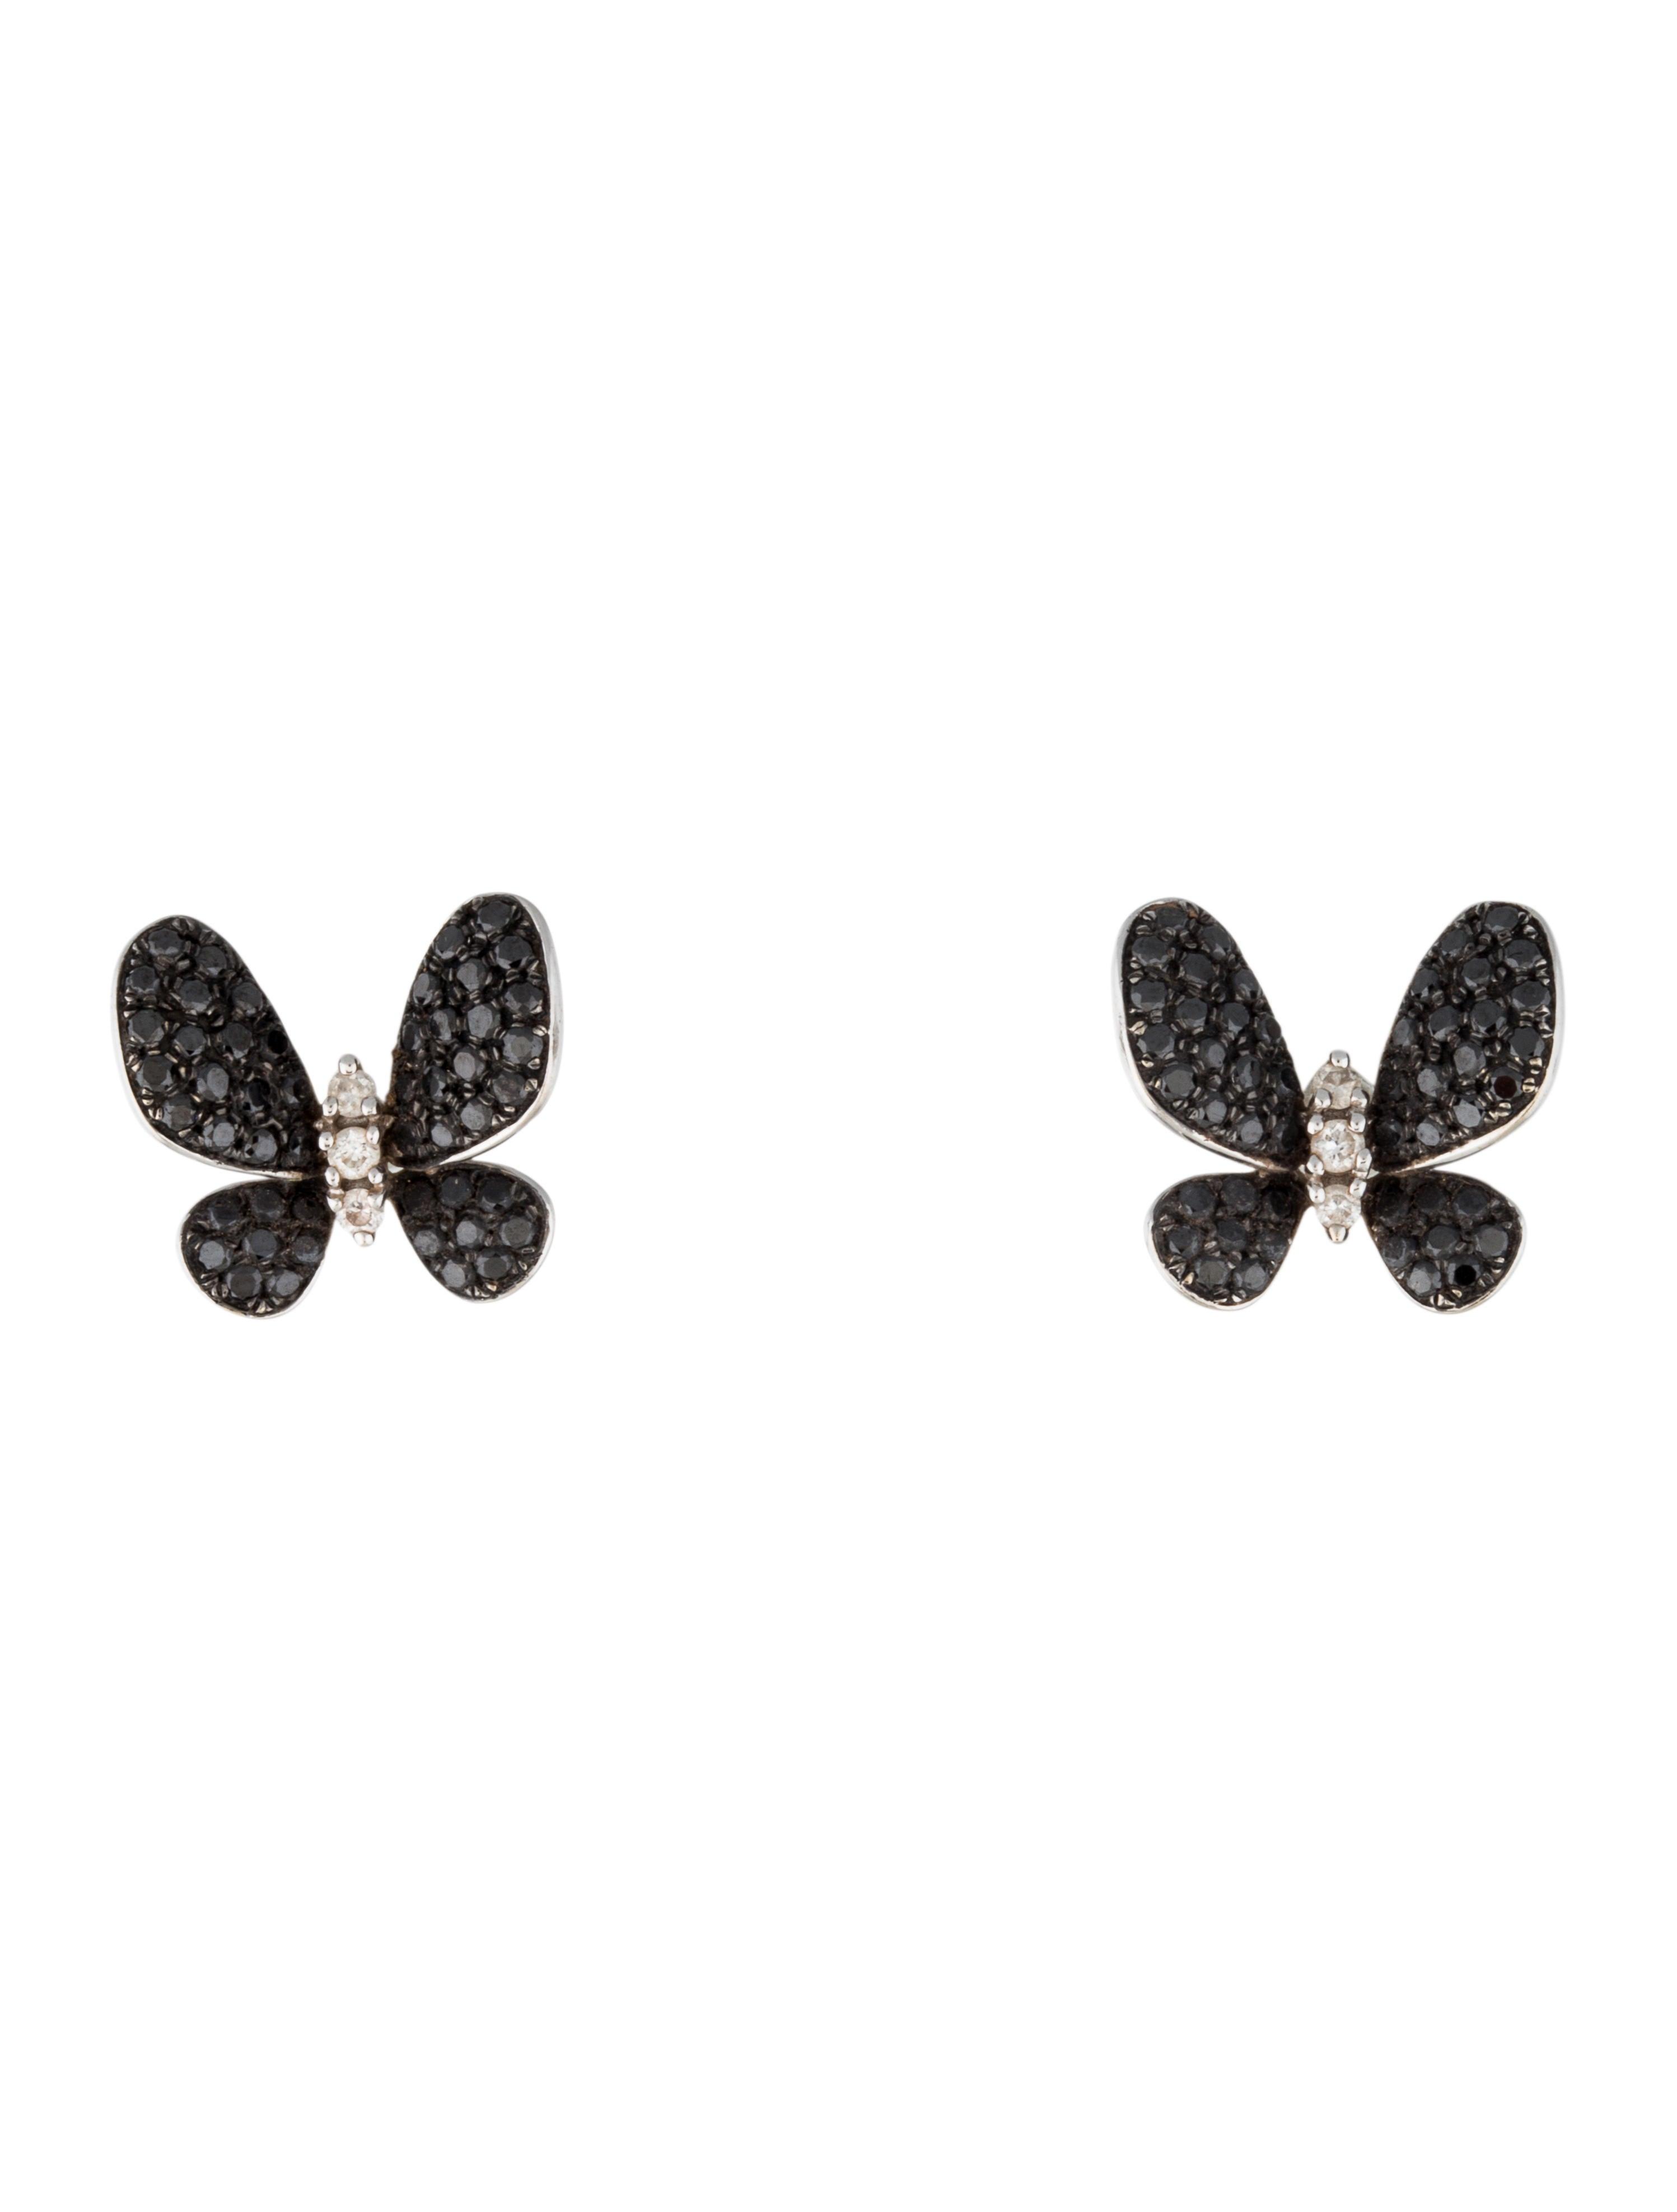 18k black and white diamond butterfly earrings earrings. Black Bedroom Furniture Sets. Home Design Ideas